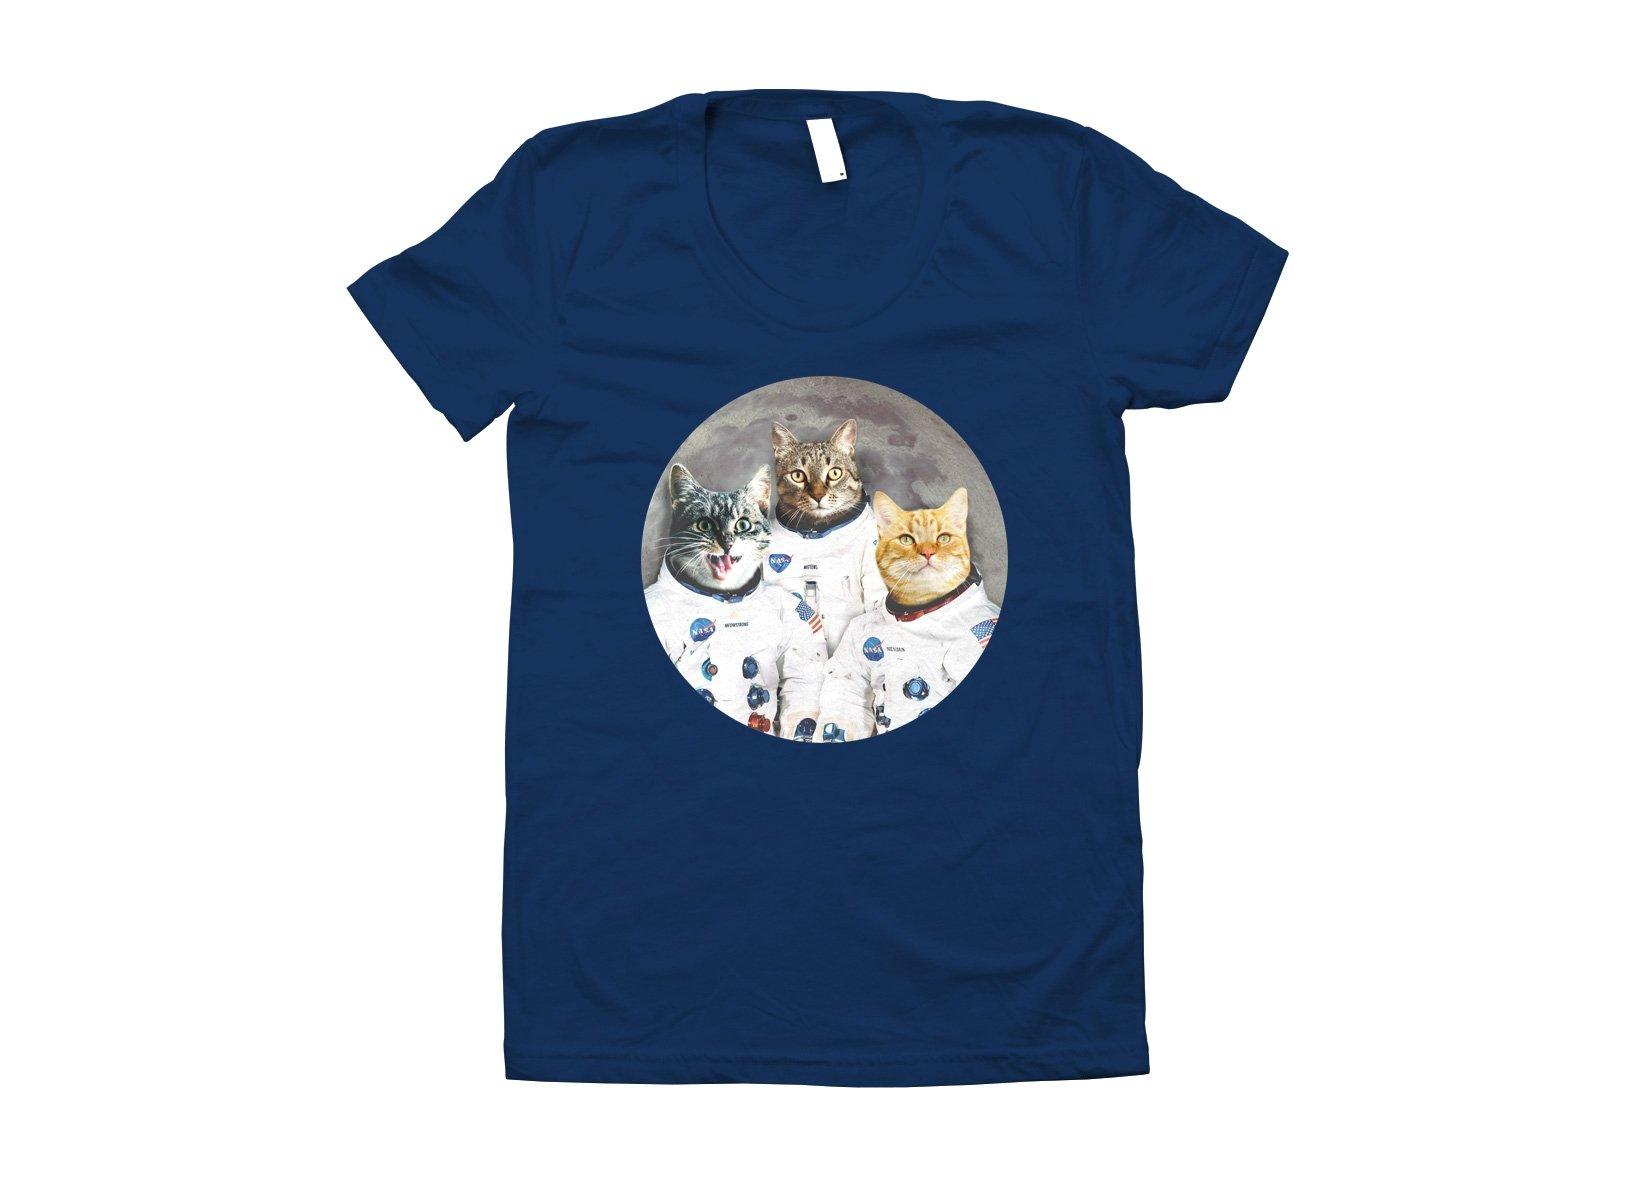 Catstronauts on Juniors T-Shirt